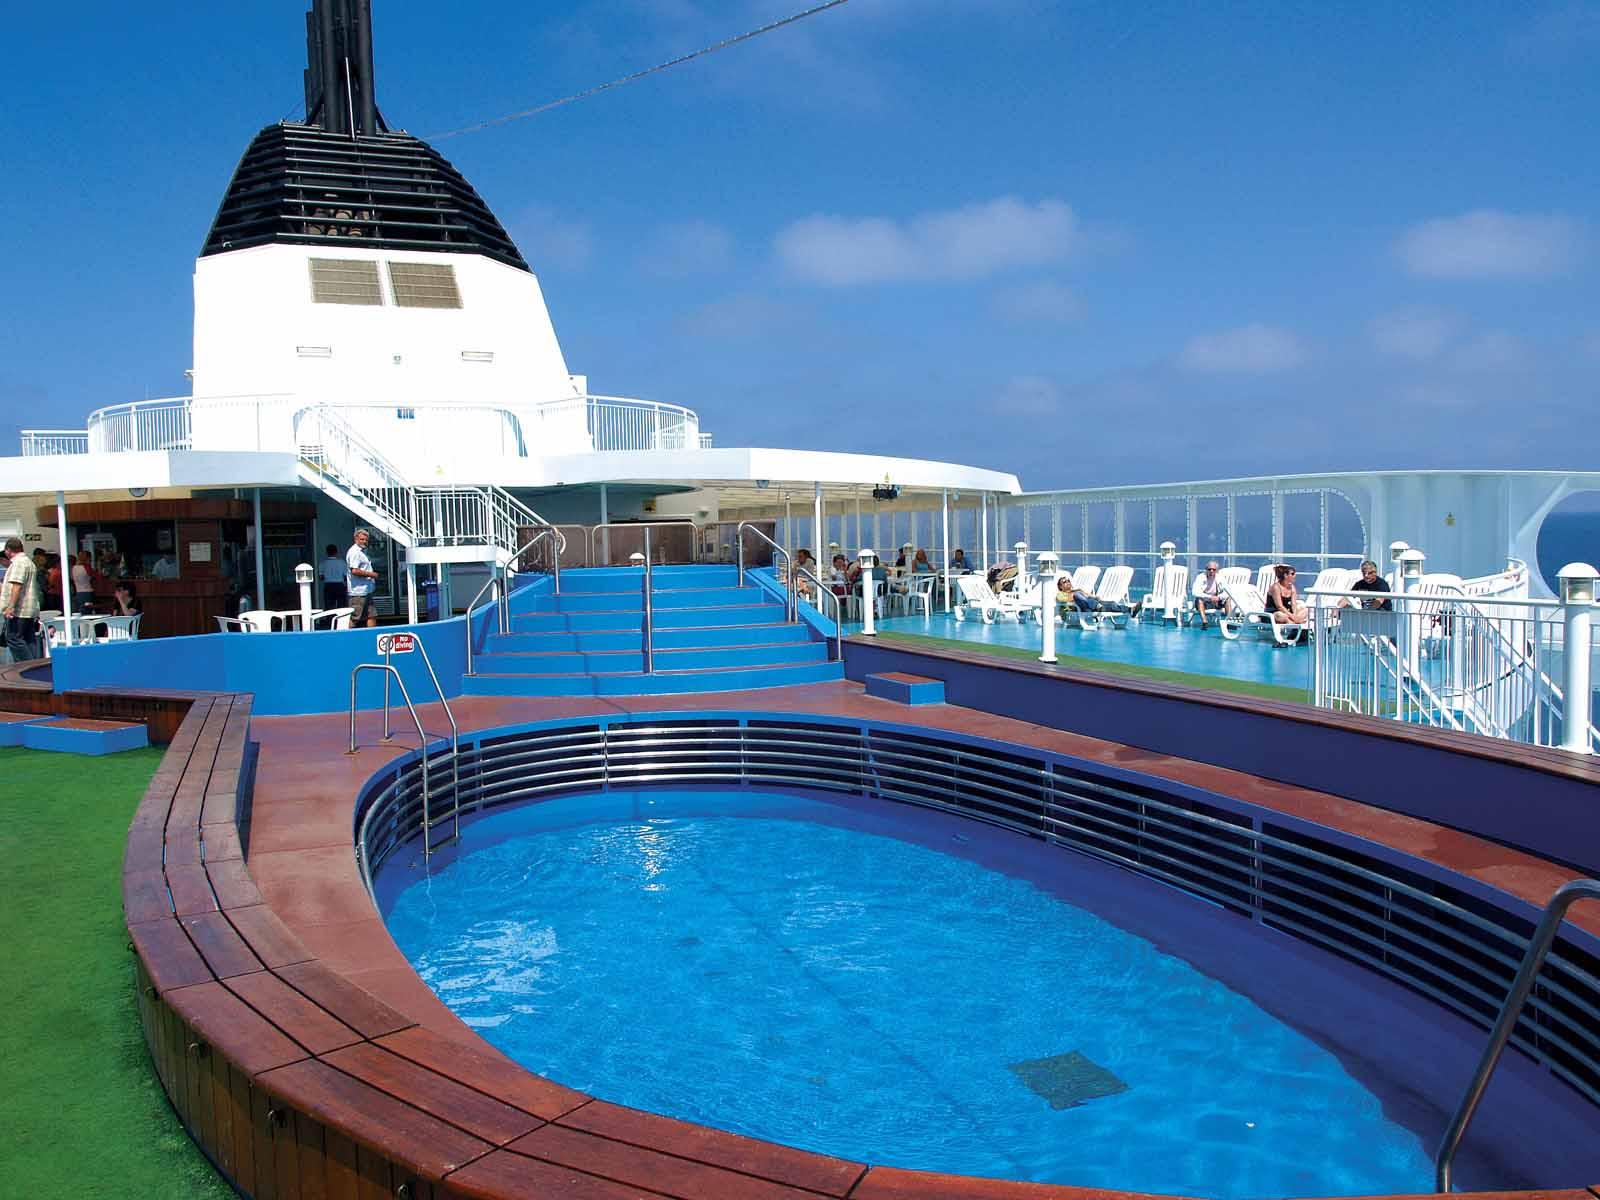 H/S/F Hellenic Spirit Swimming Pool